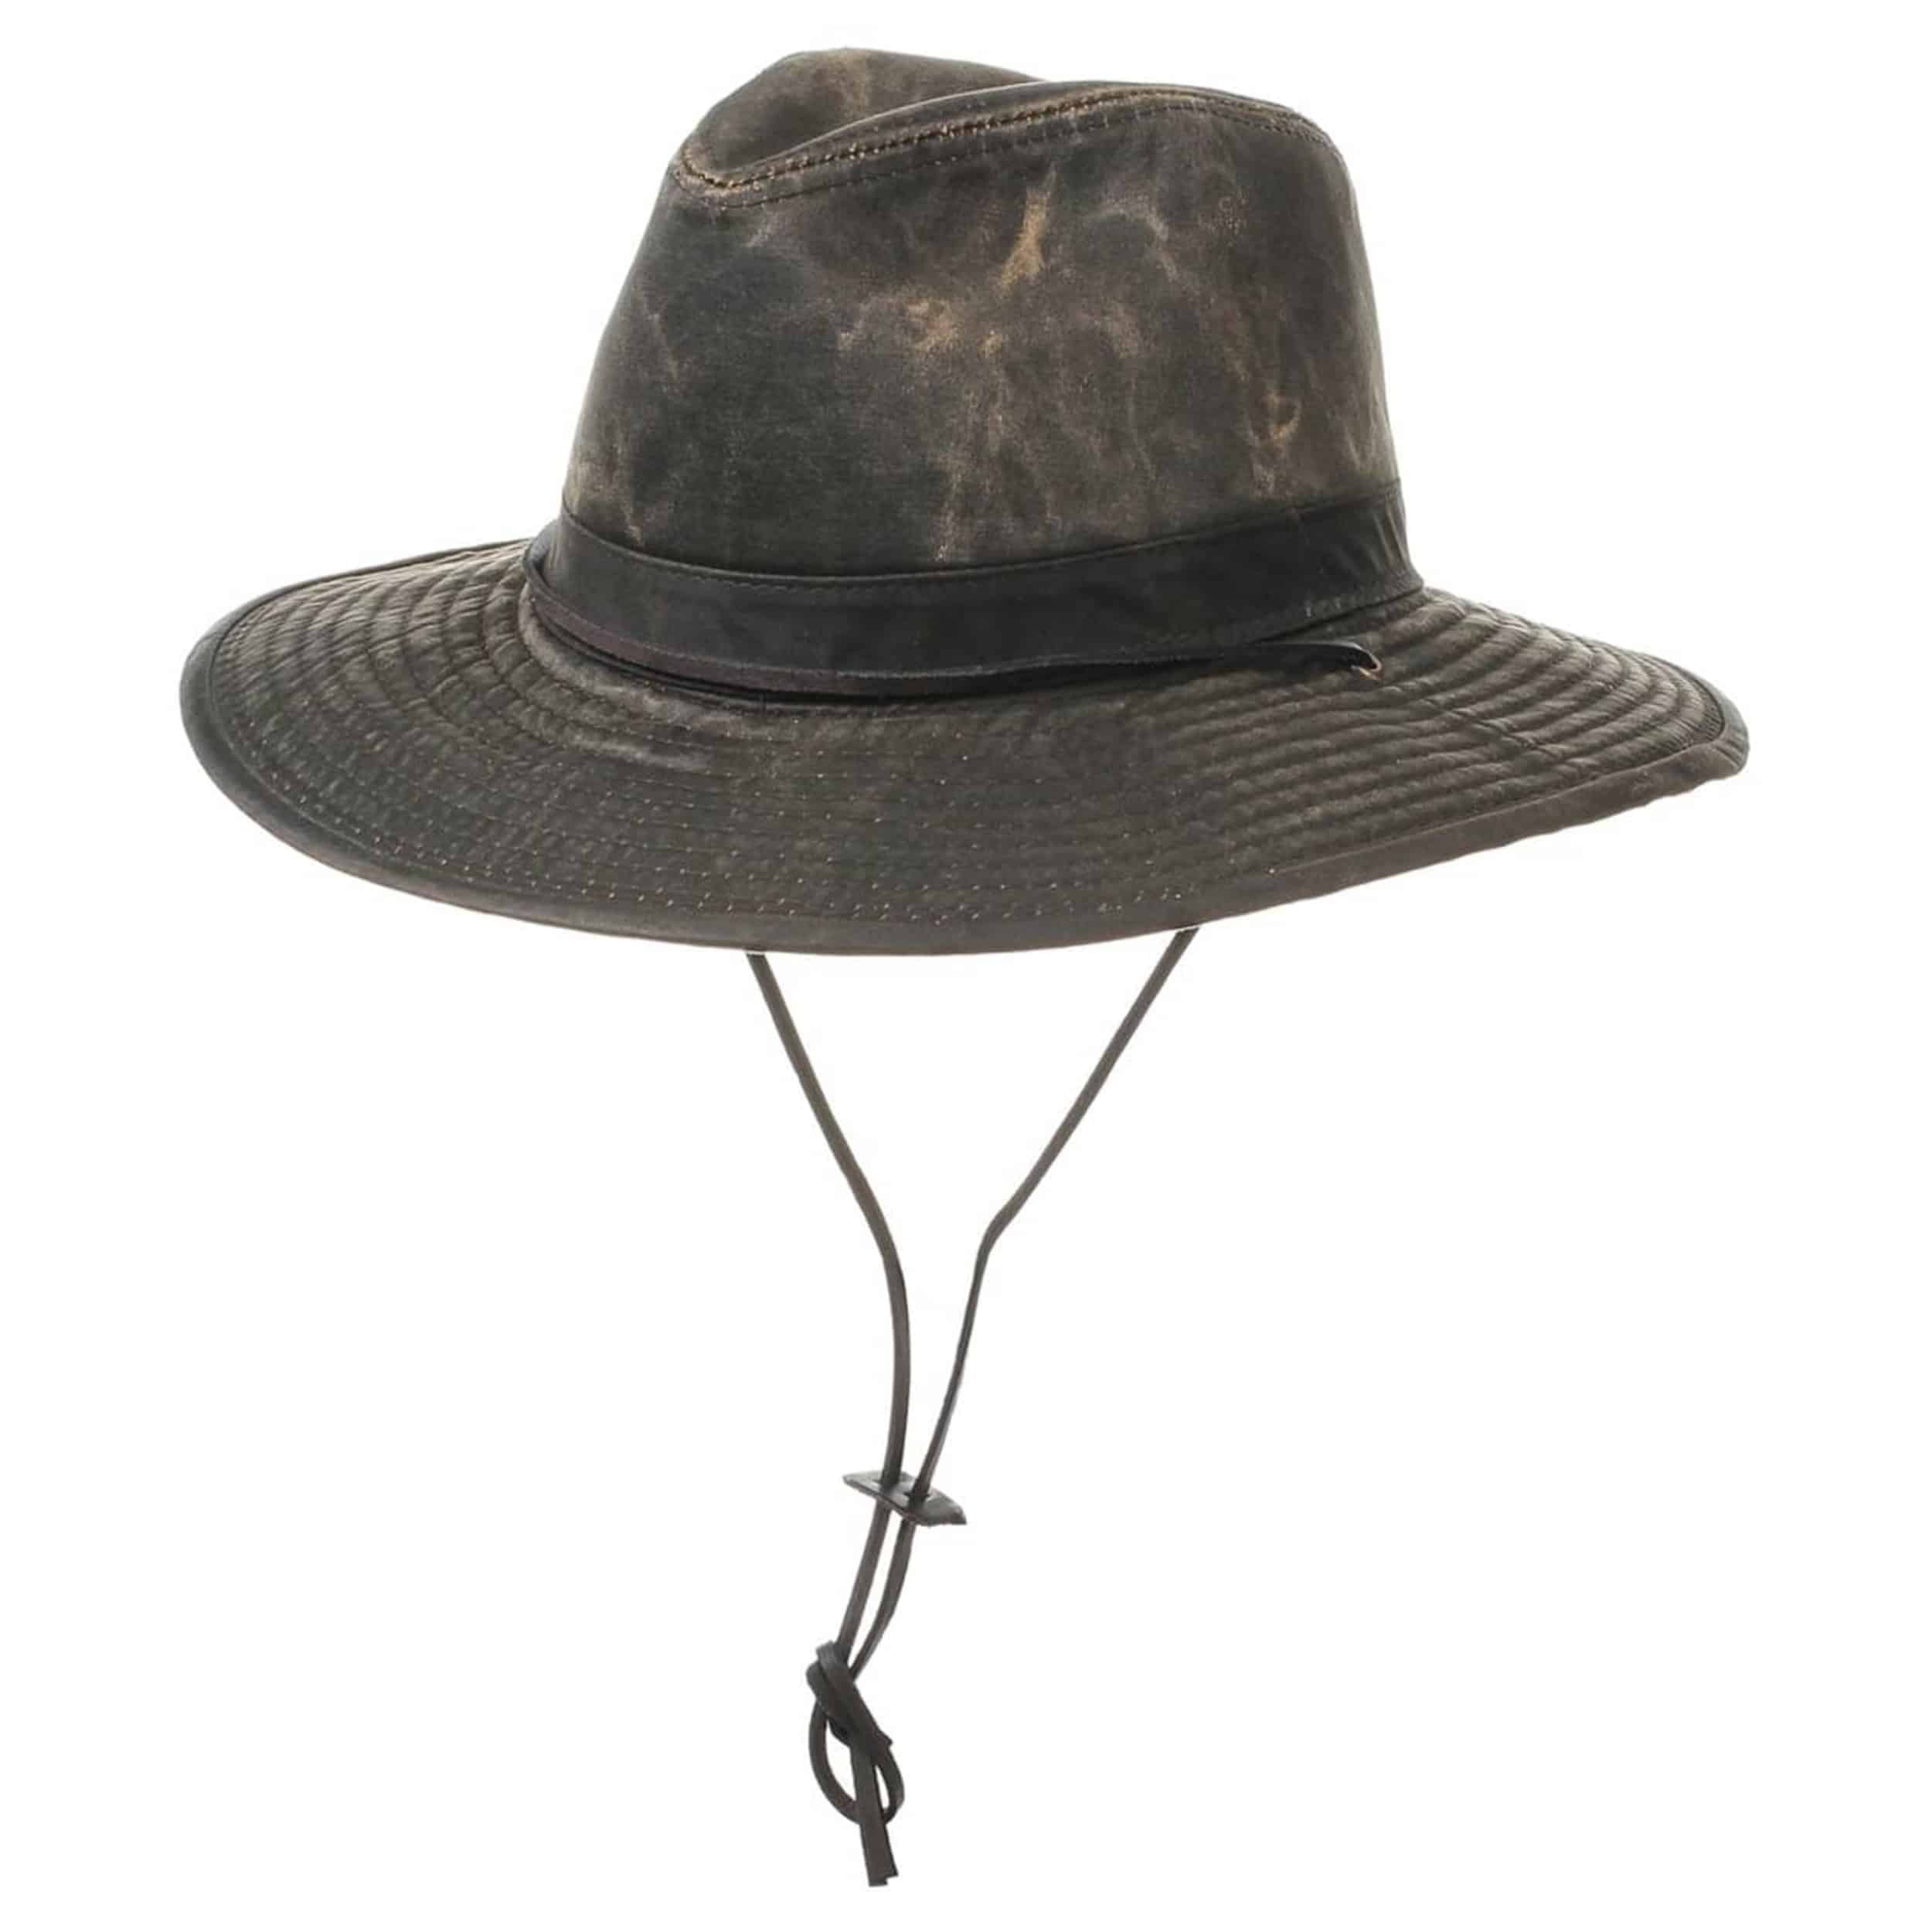 Diaz Cappello Outdoor Stetson cappello di tessuto cappello da cowboy 91c1e2740493